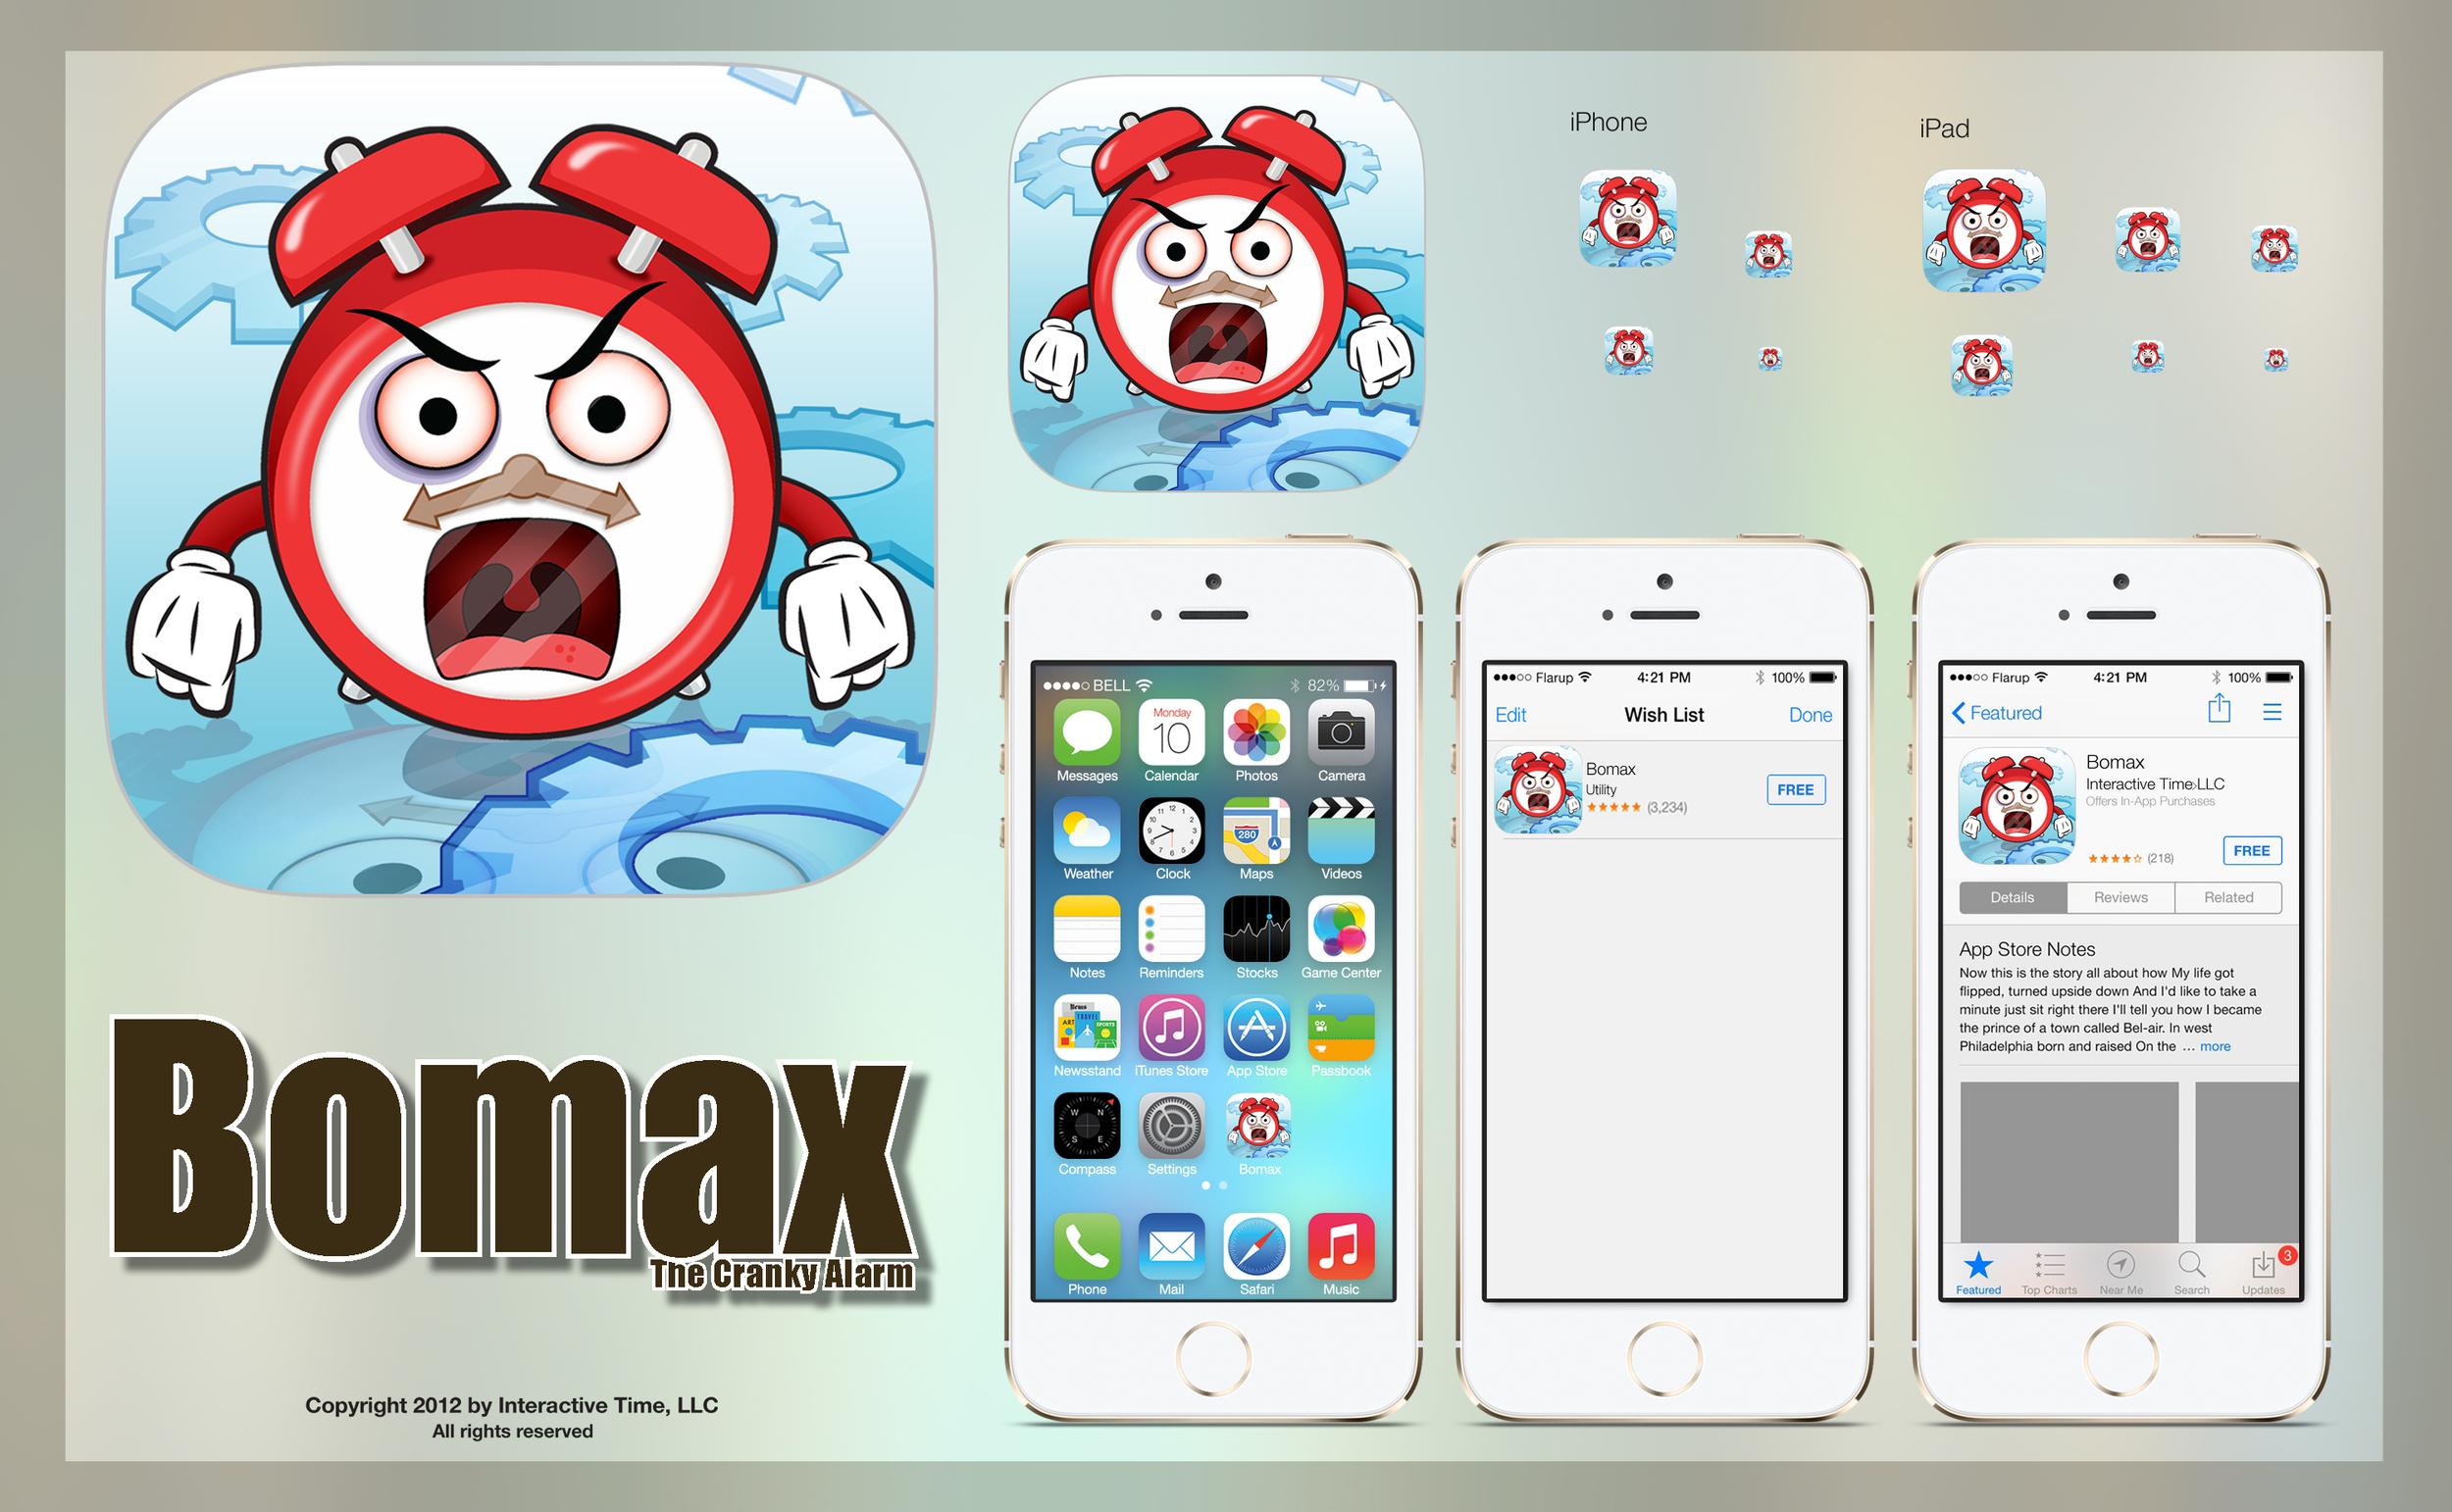 Bomax the Cranky Alarm iOS icon sheet